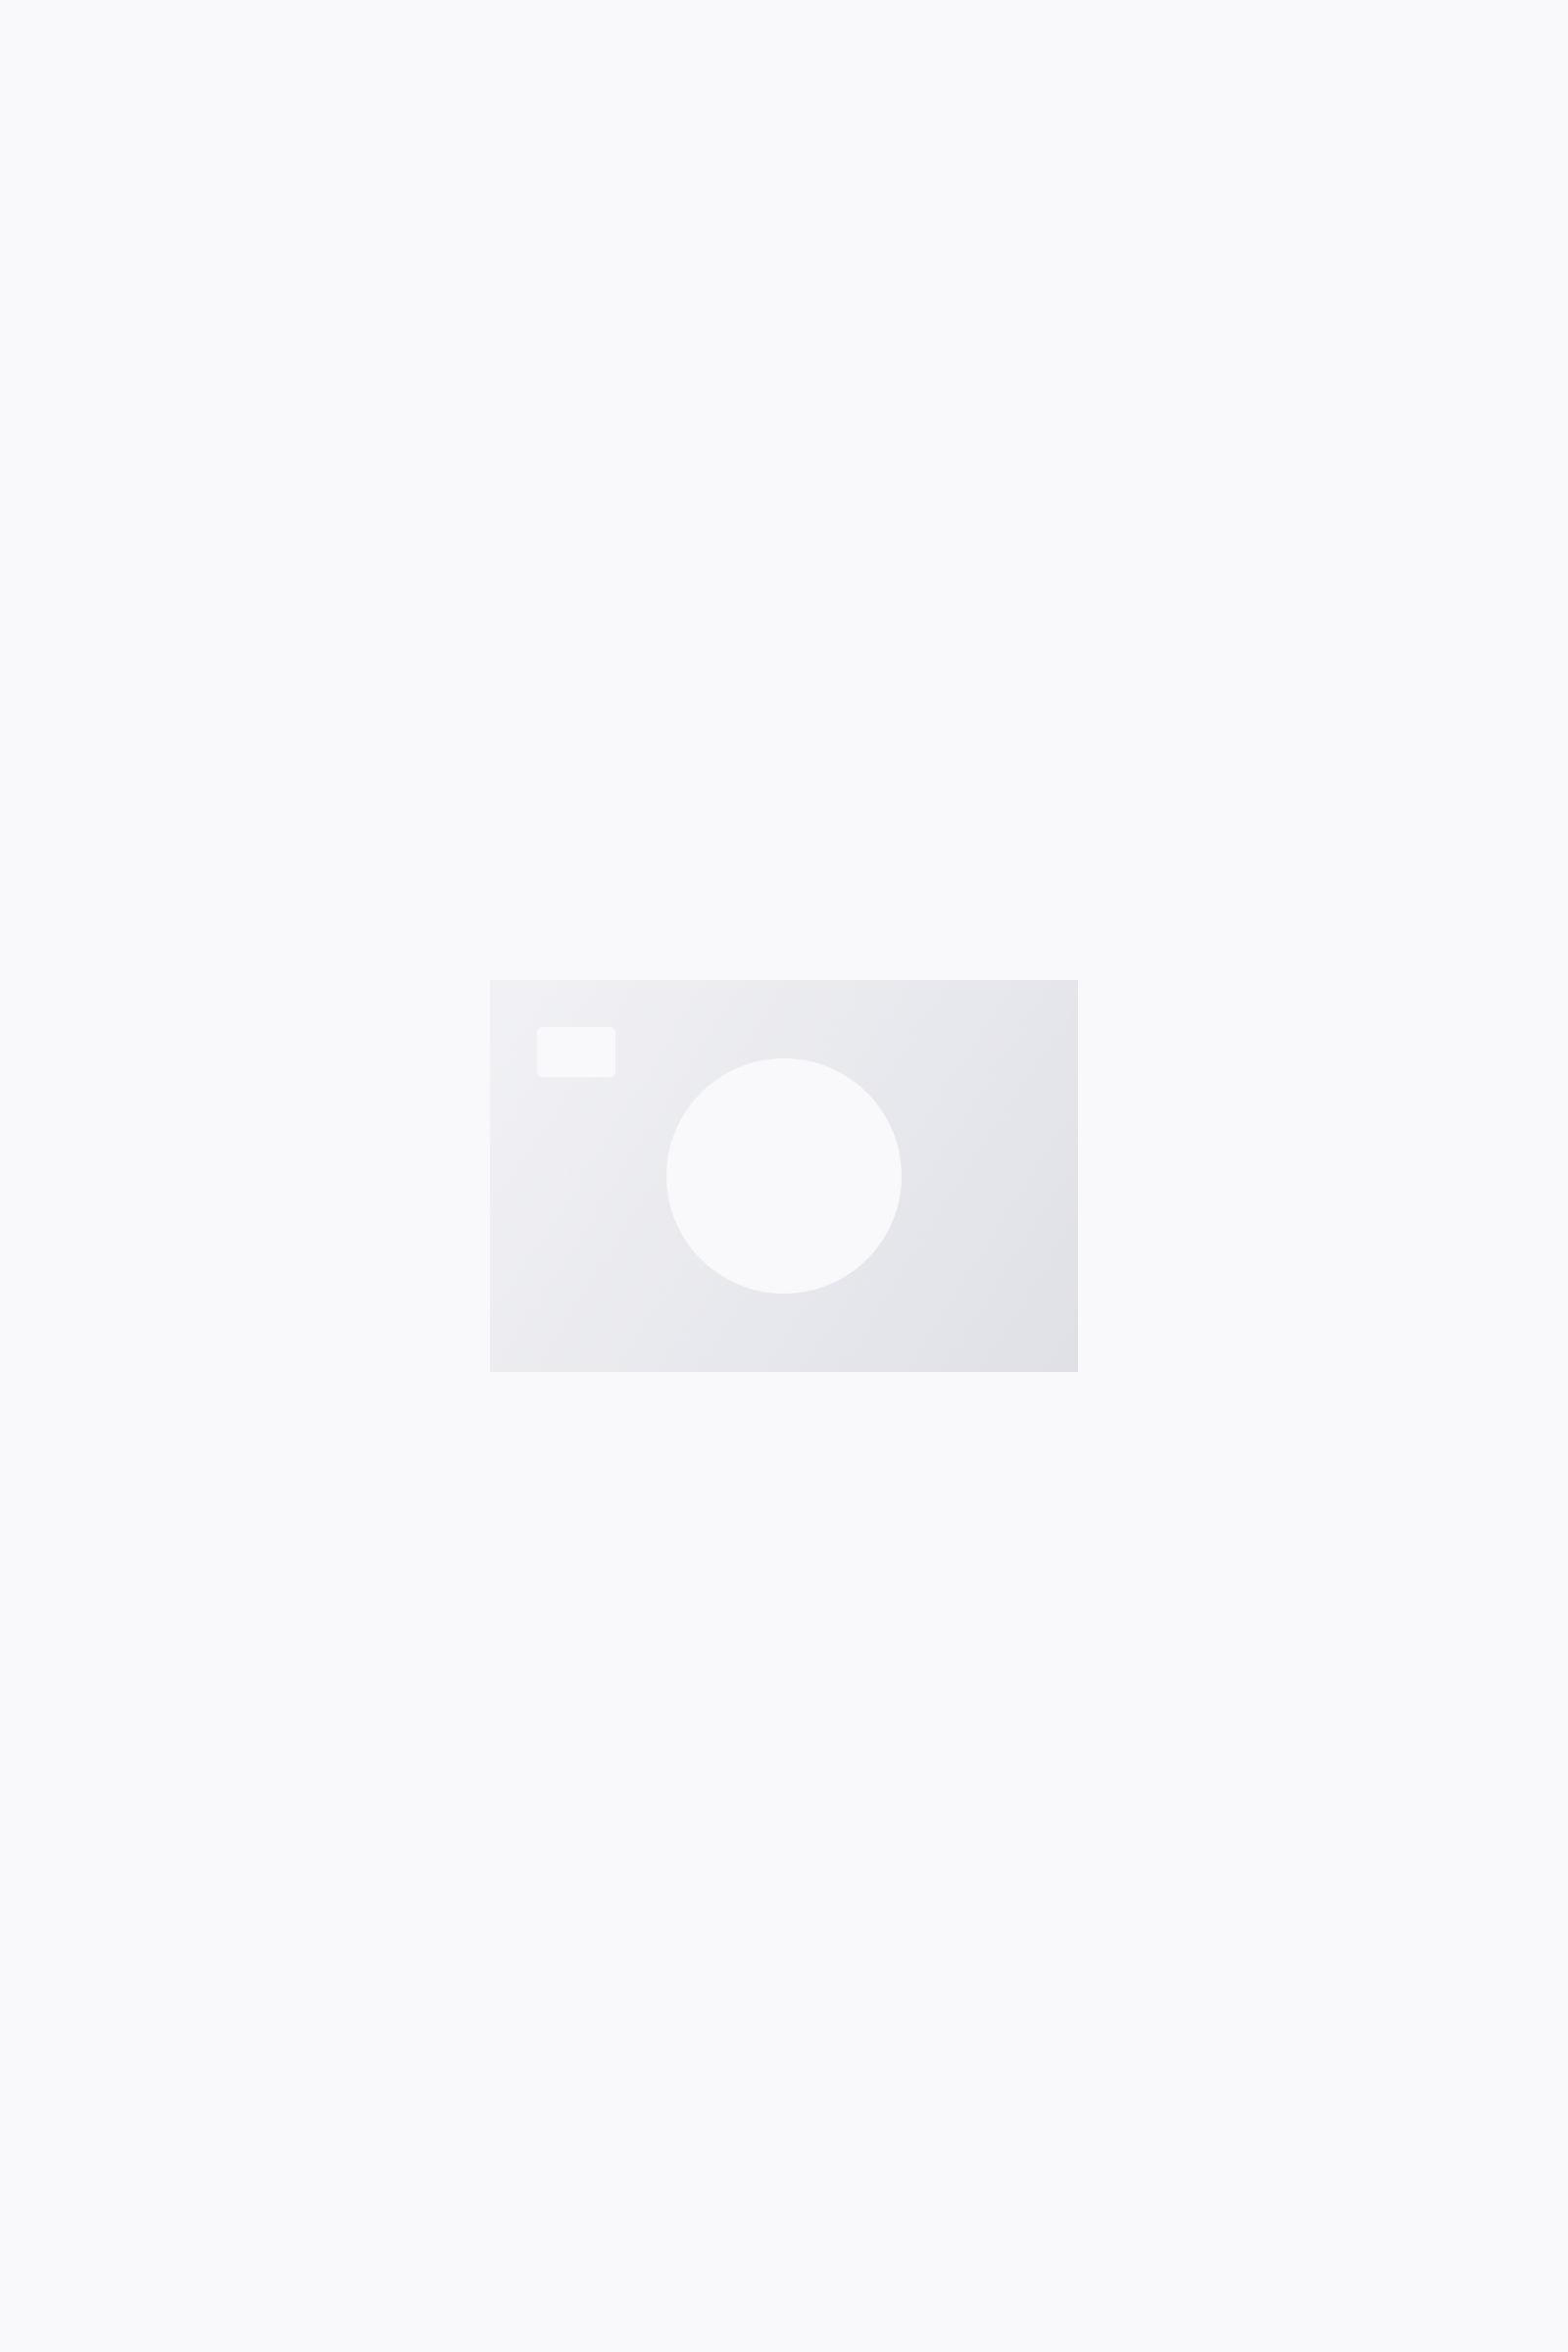 COS DRAPED MIDI SKIRT,Off-white